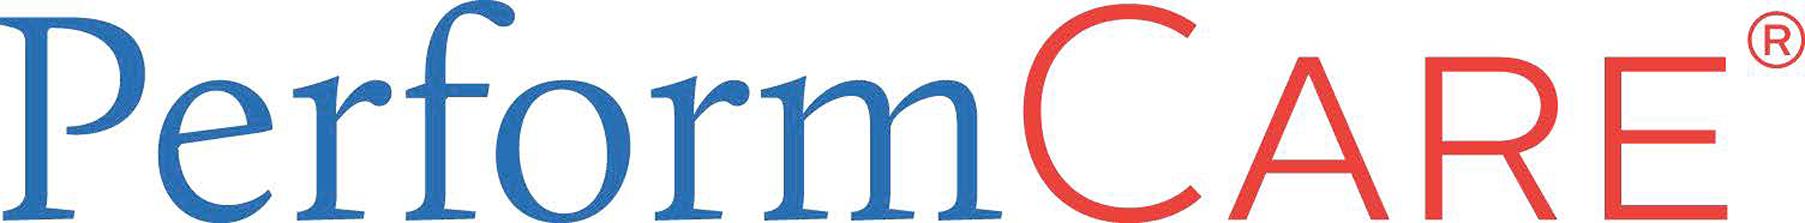 Final Website PerformCare Logo